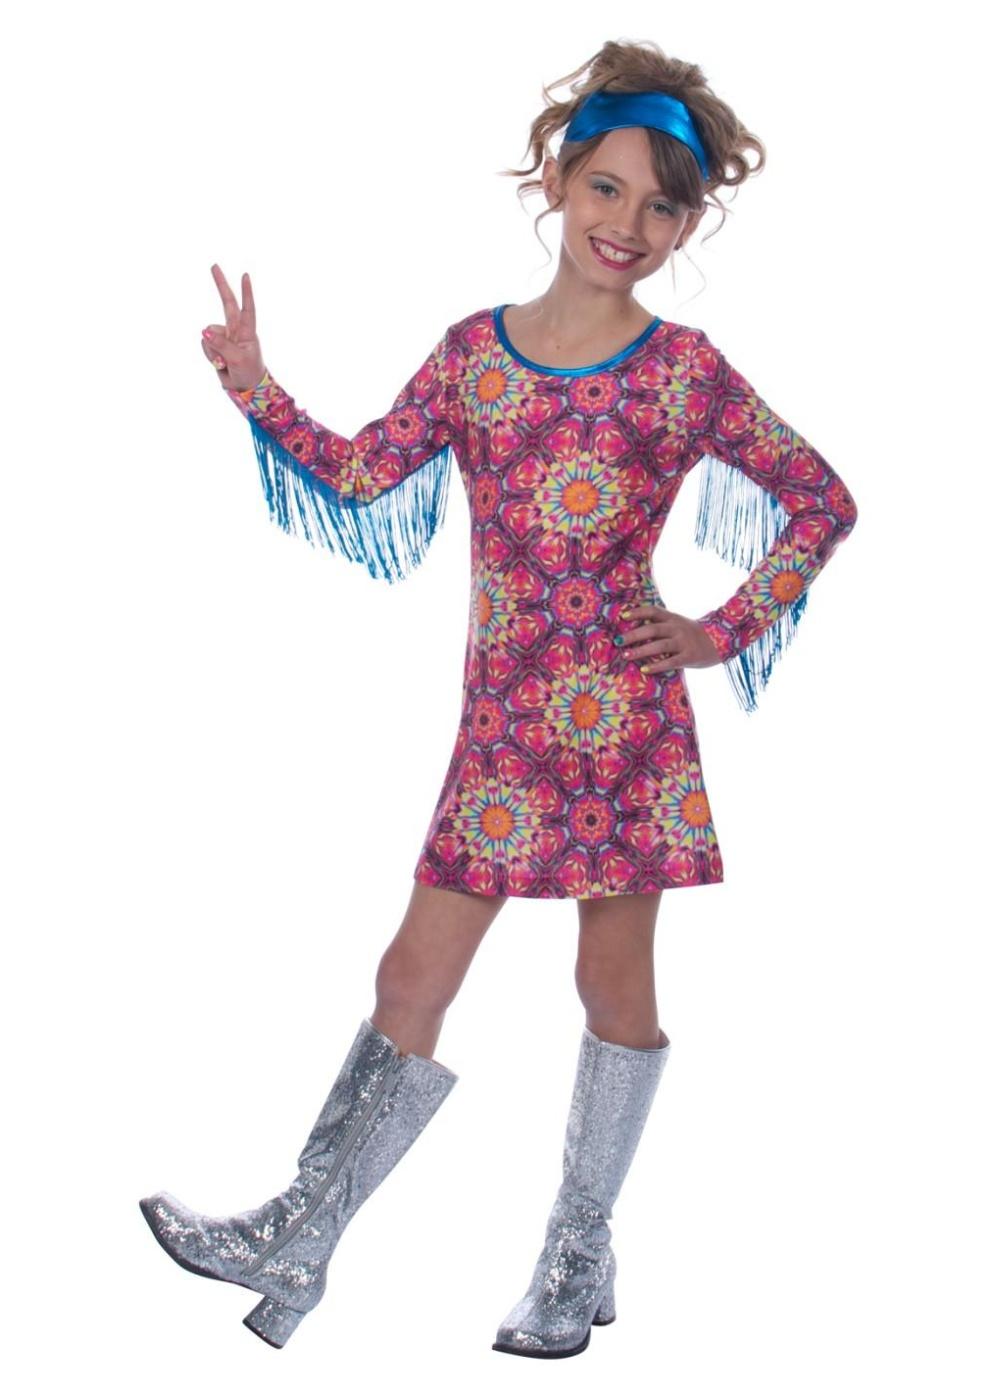 Hippie Girl Halloween Costume.Free Spirit Hippie Girl Halloween Costume 1970s Costumes